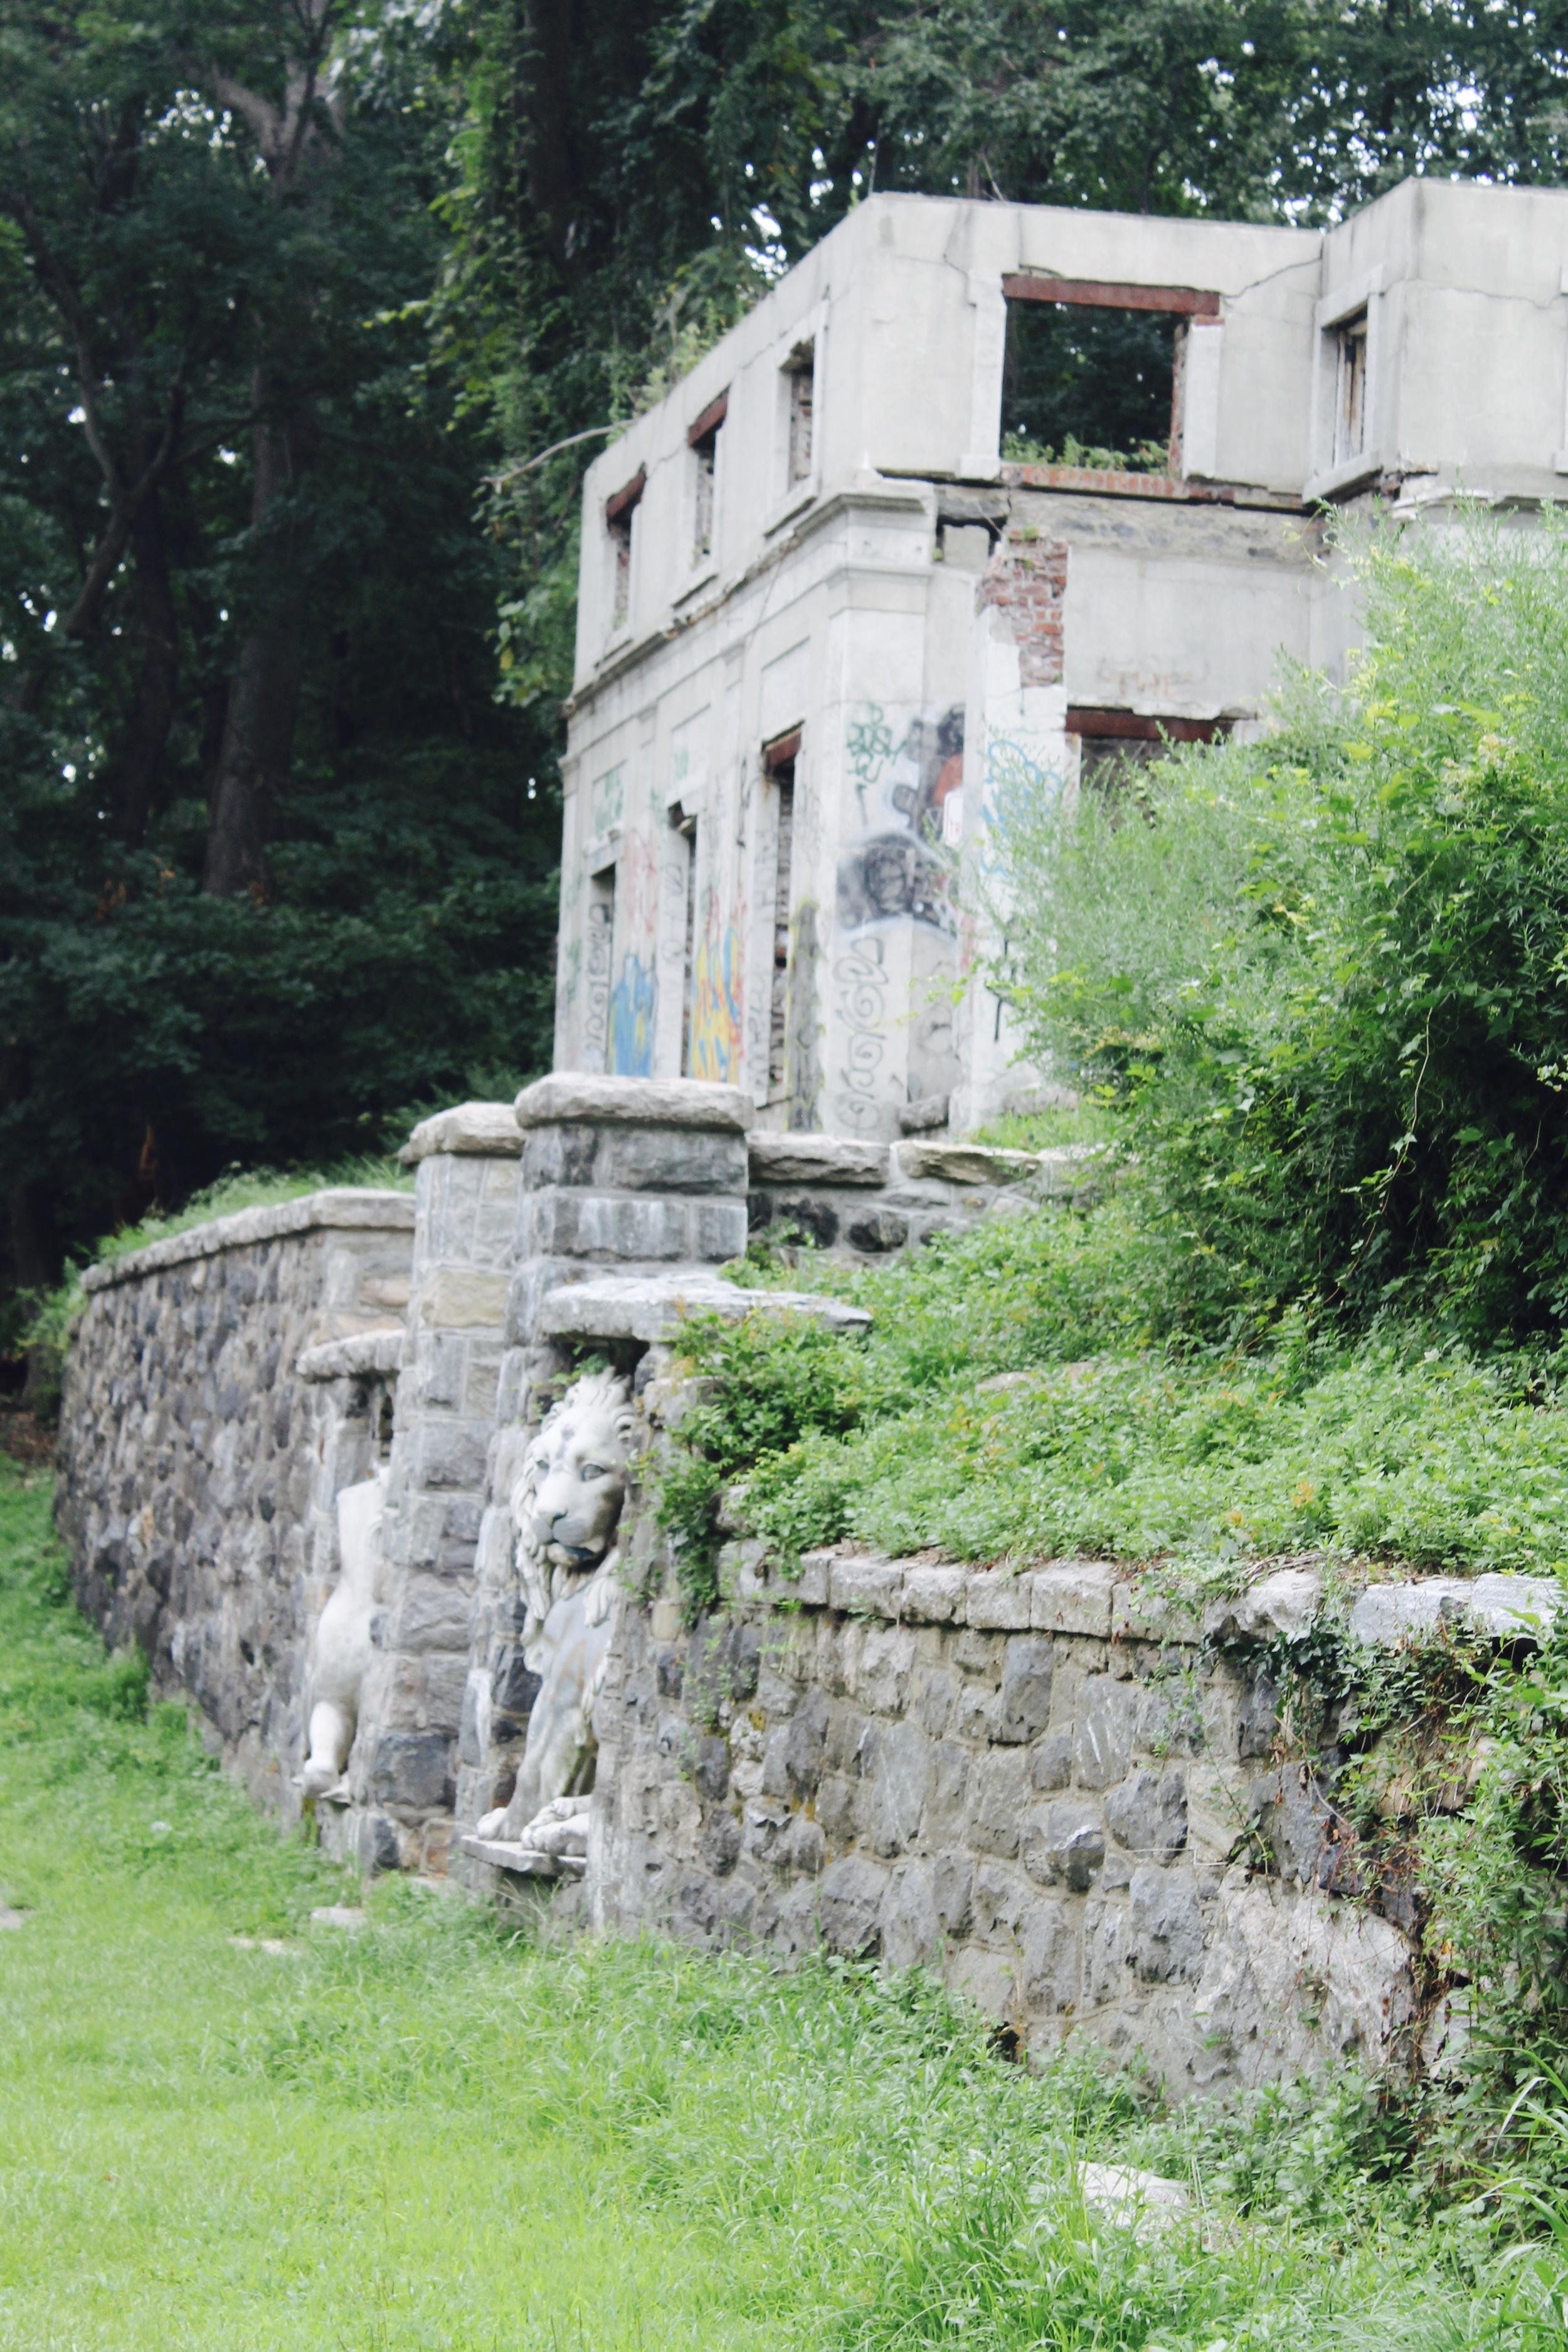 The Untermeyer Gardens: Hidden Gems of New York City - Photography property of Jessica Gordon Ryan/The Entertaining House